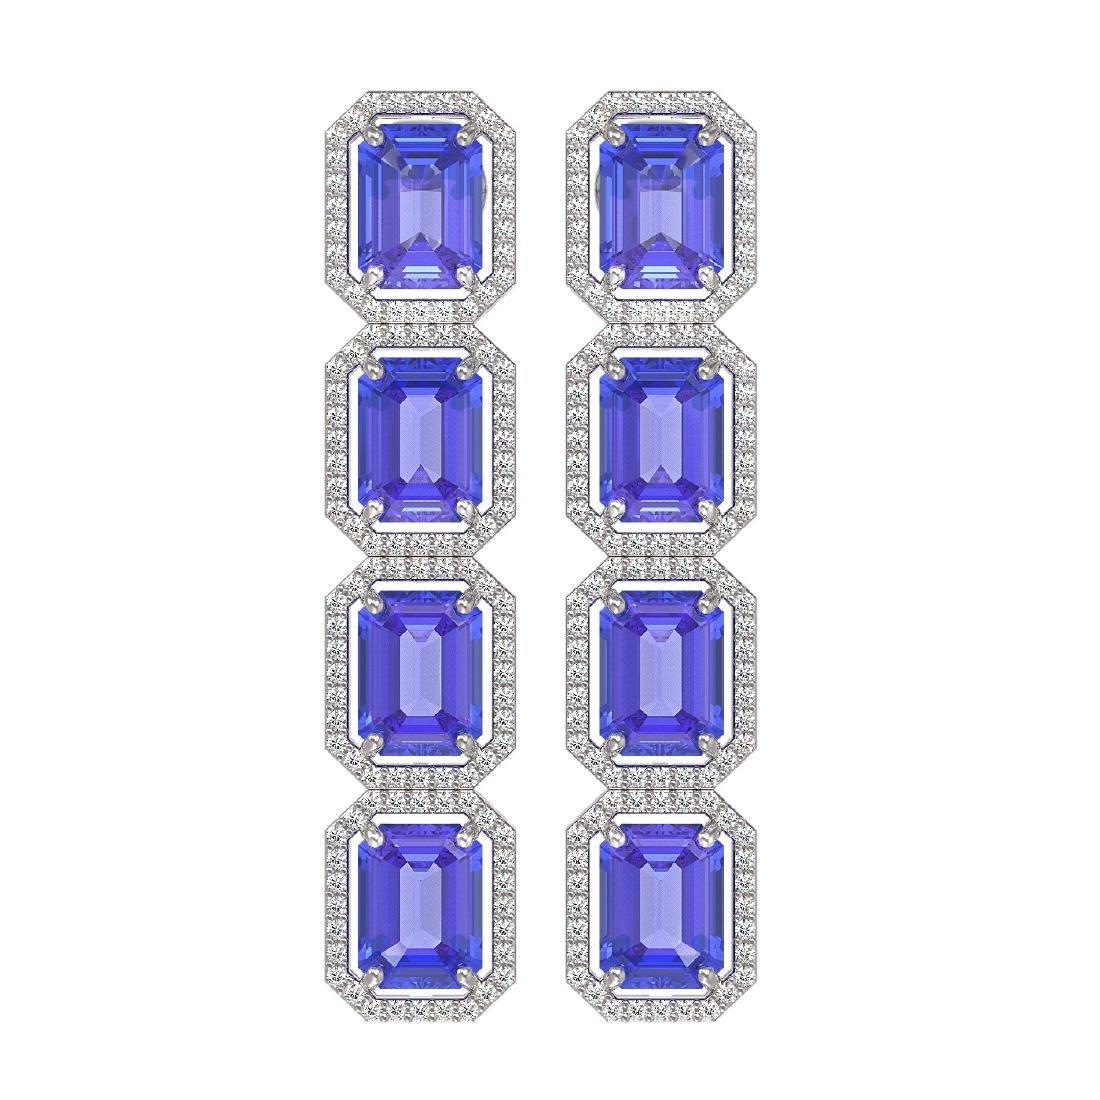 19.39 CTW Tanzanite & Diamond Halo Earrings 10K White